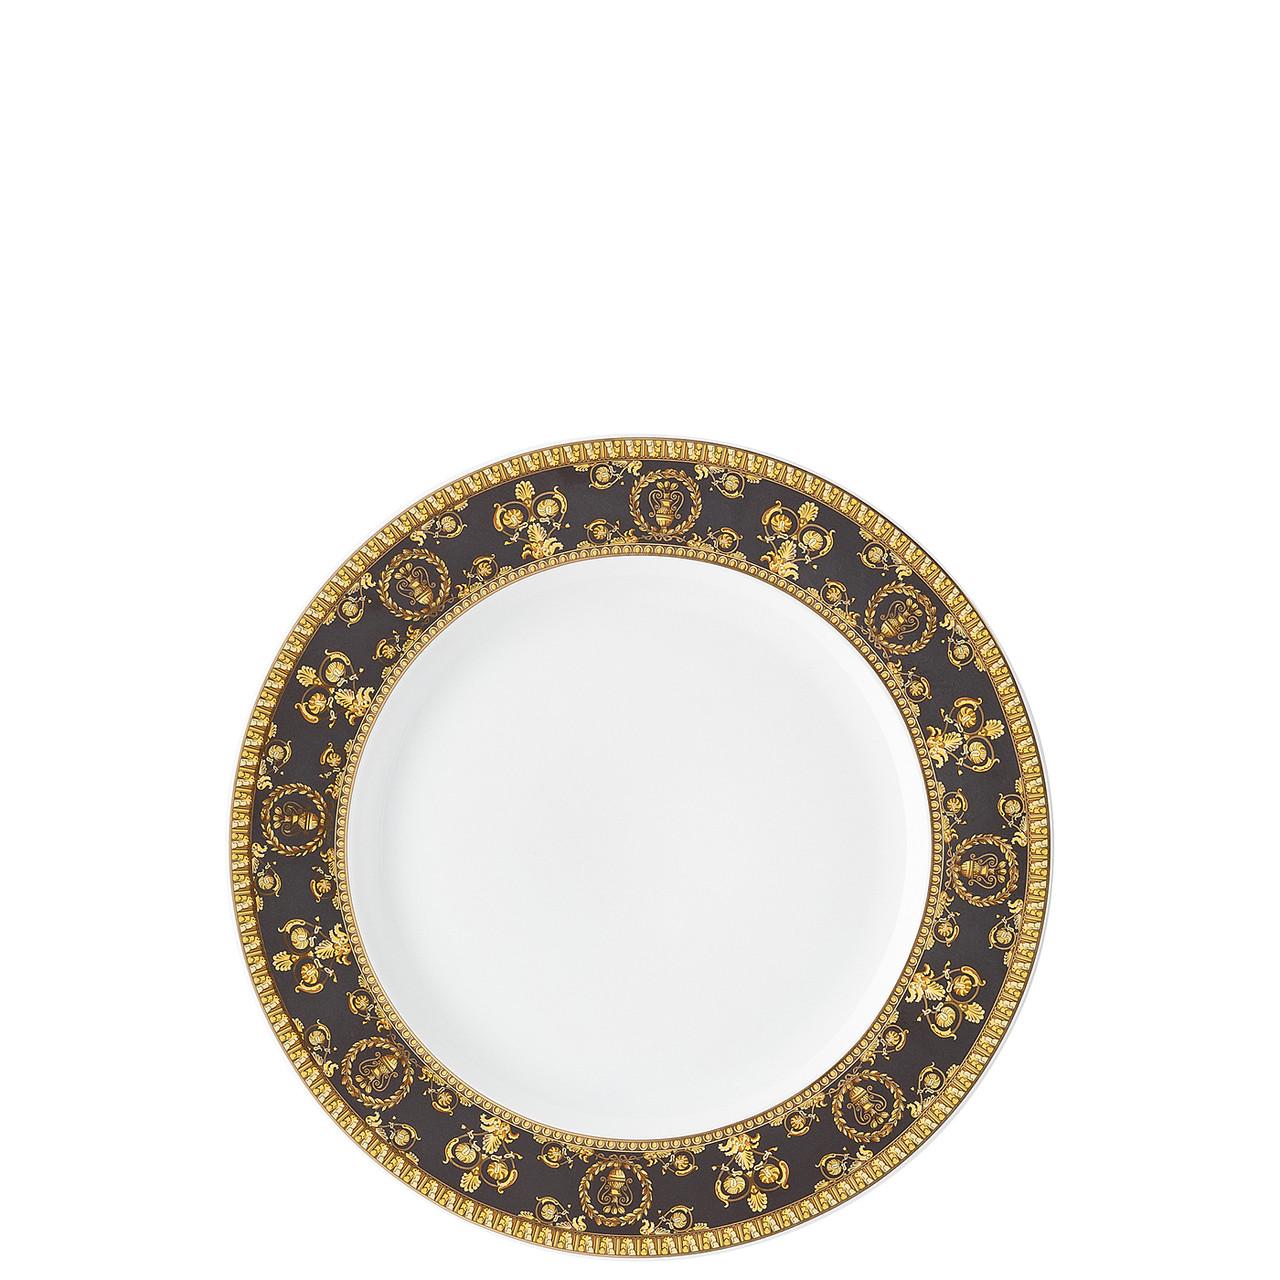 Salad Plate 8 1/2 inch | I Love Baroque Nero  sc 1 st  Rosenthal & Salad Plate 8 1/2 inch | I Love Baroque Nero | Rosenthal Shop